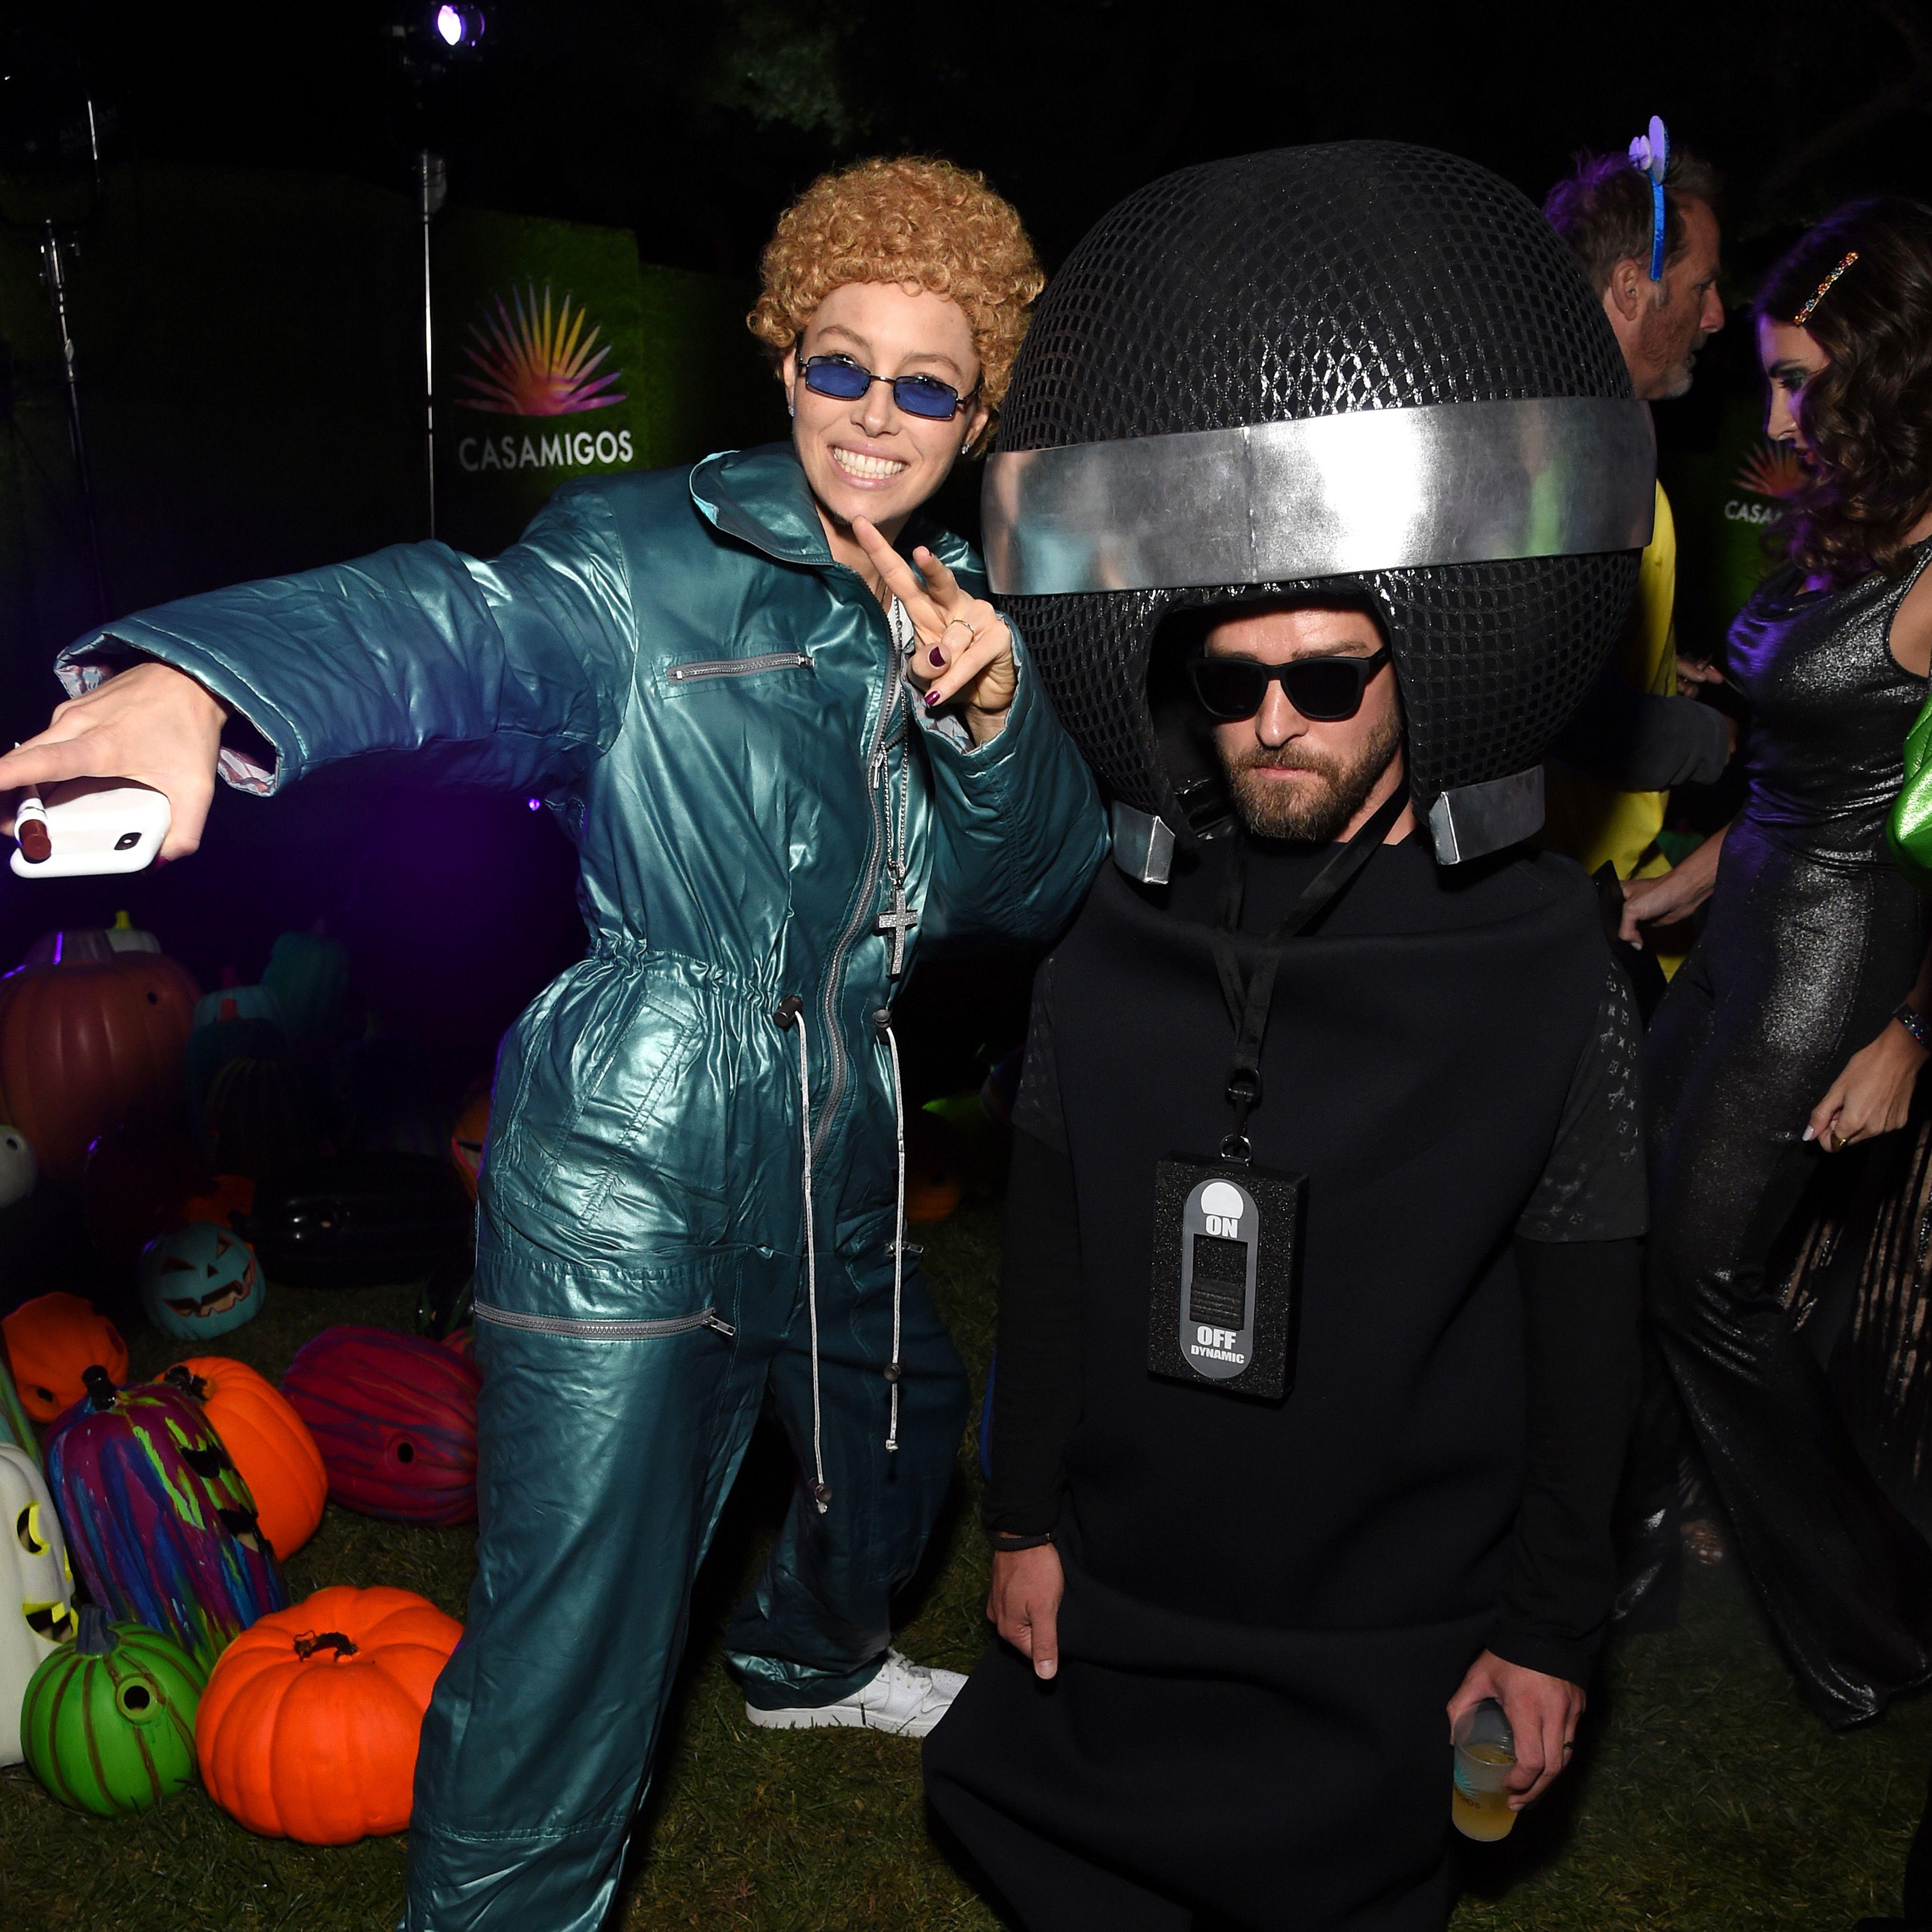 Celebrity Halloween 2020 Jessica Rabbit 10 Best Celebrity Halloween Costumes of 2019   Jessica Biel and